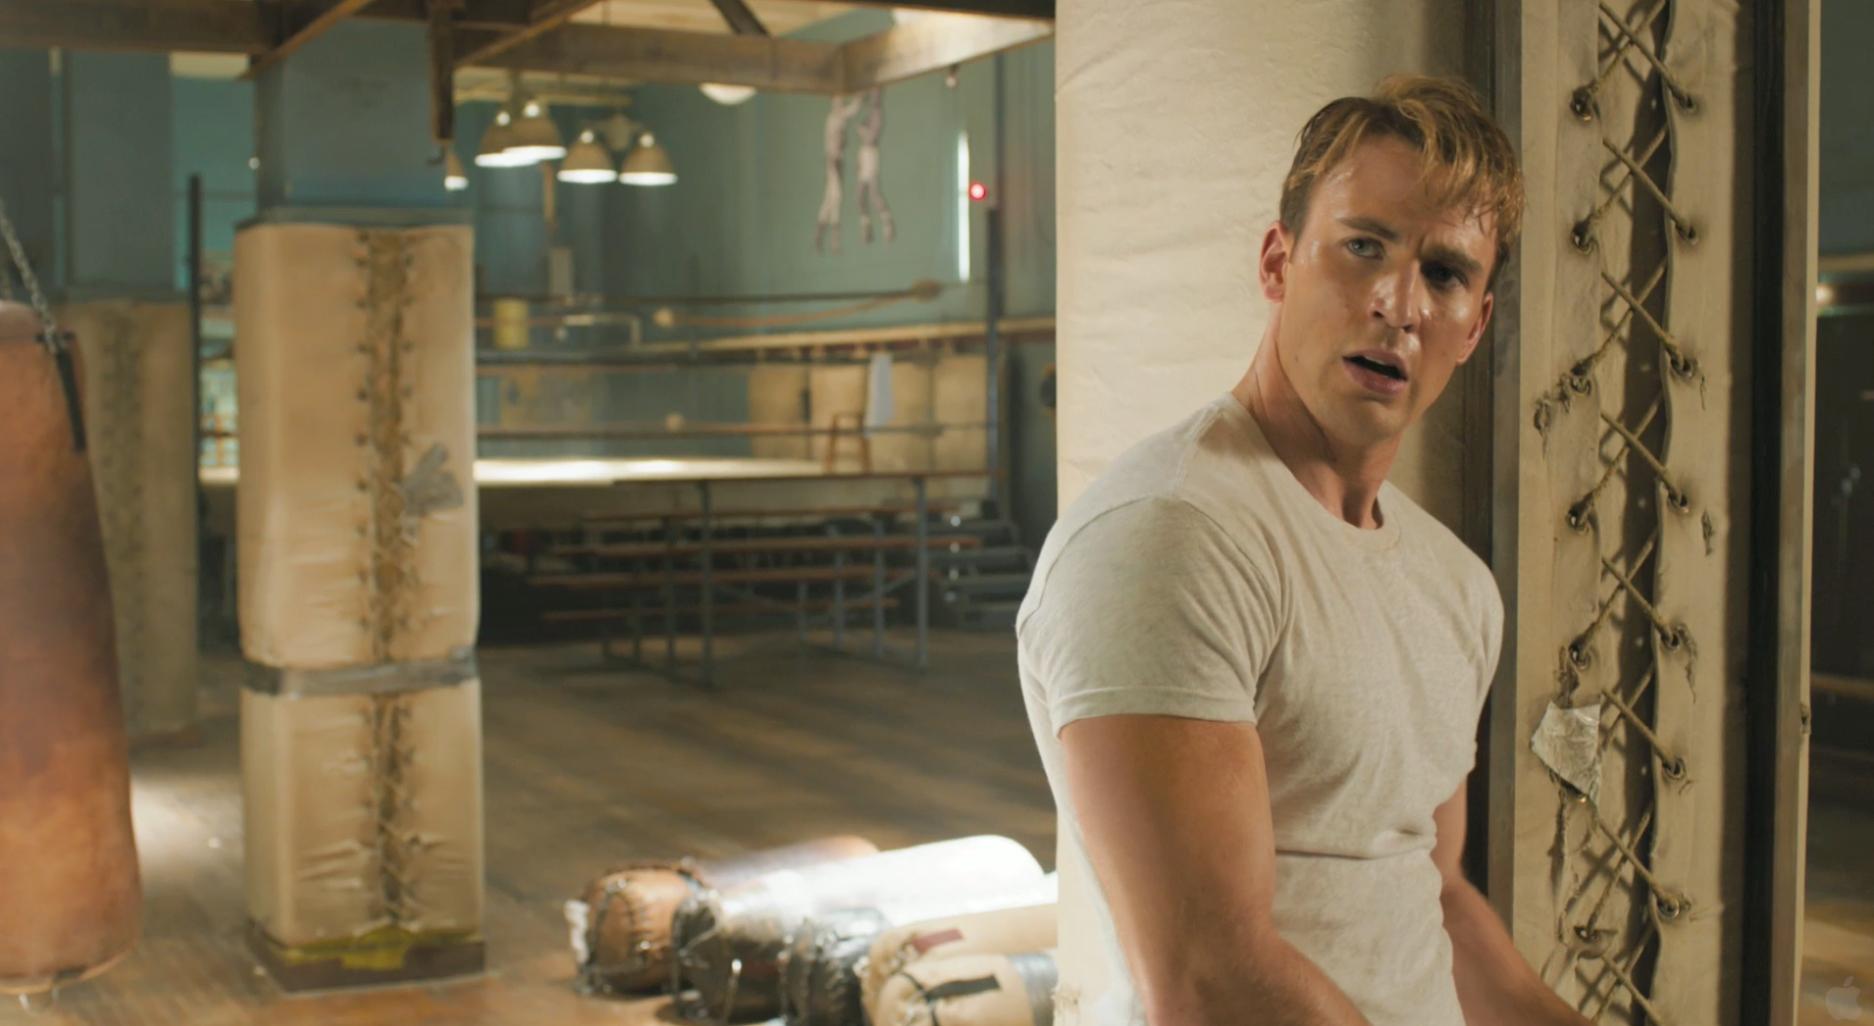 http://www.chud.com/wp-content/uploads/2012/08/Chris-Evans-The-Avengers-Captain-America-2.jpeg